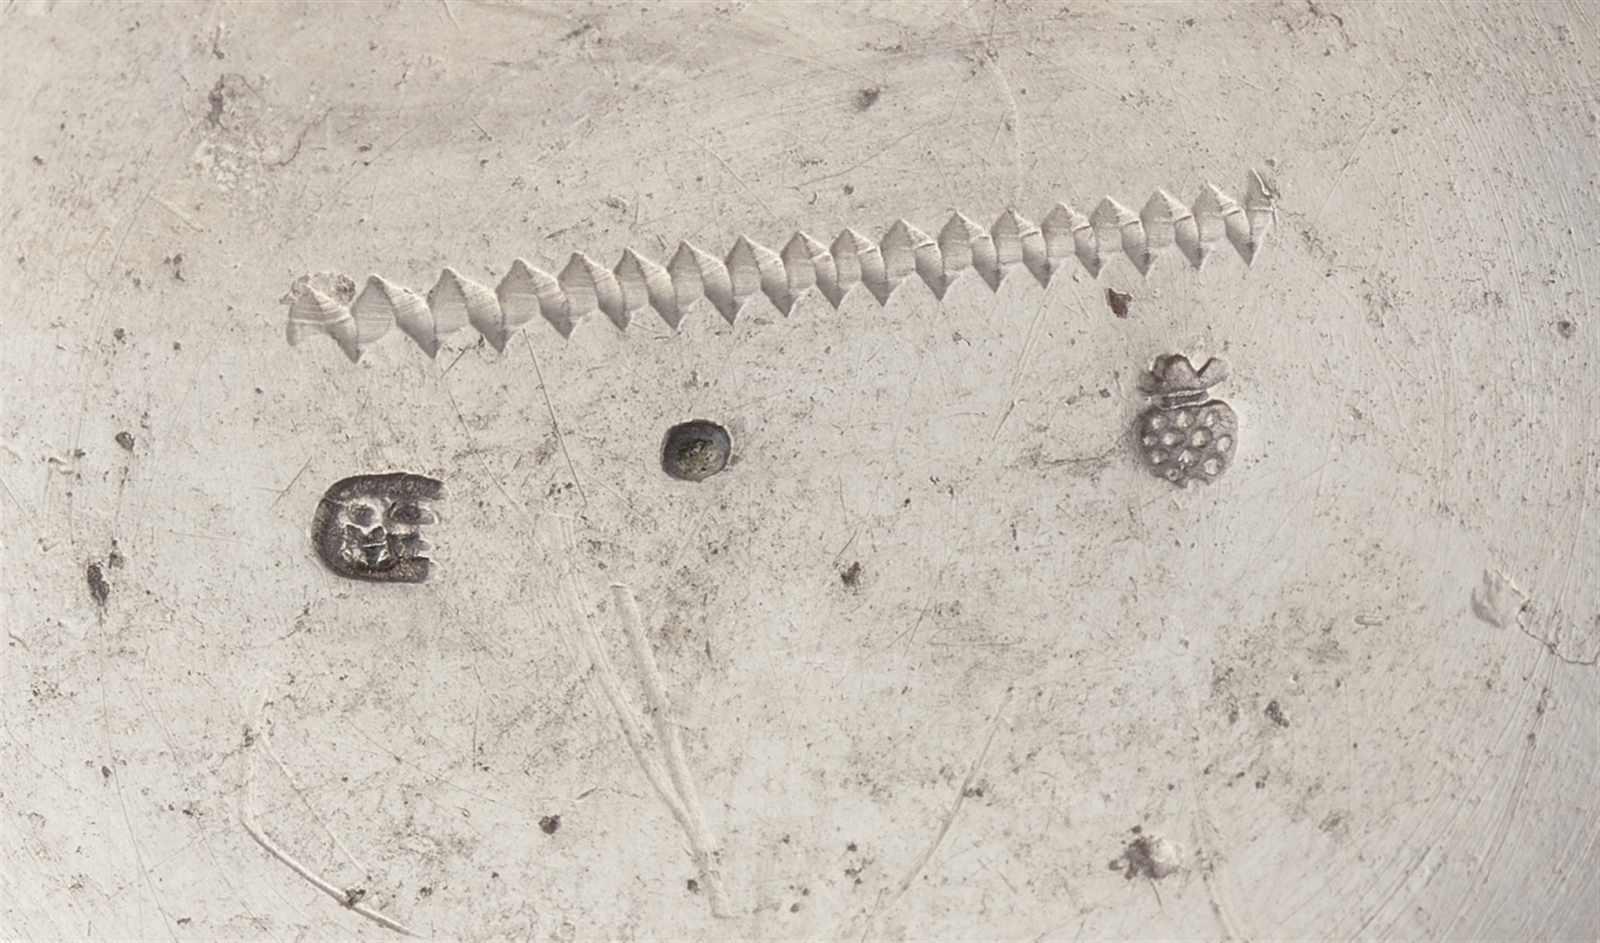 Lot 317 - An Augsburg silver gilt snakeskin beakerTapering beaker on a flat base. H 8.3 cm, weight 130 g.